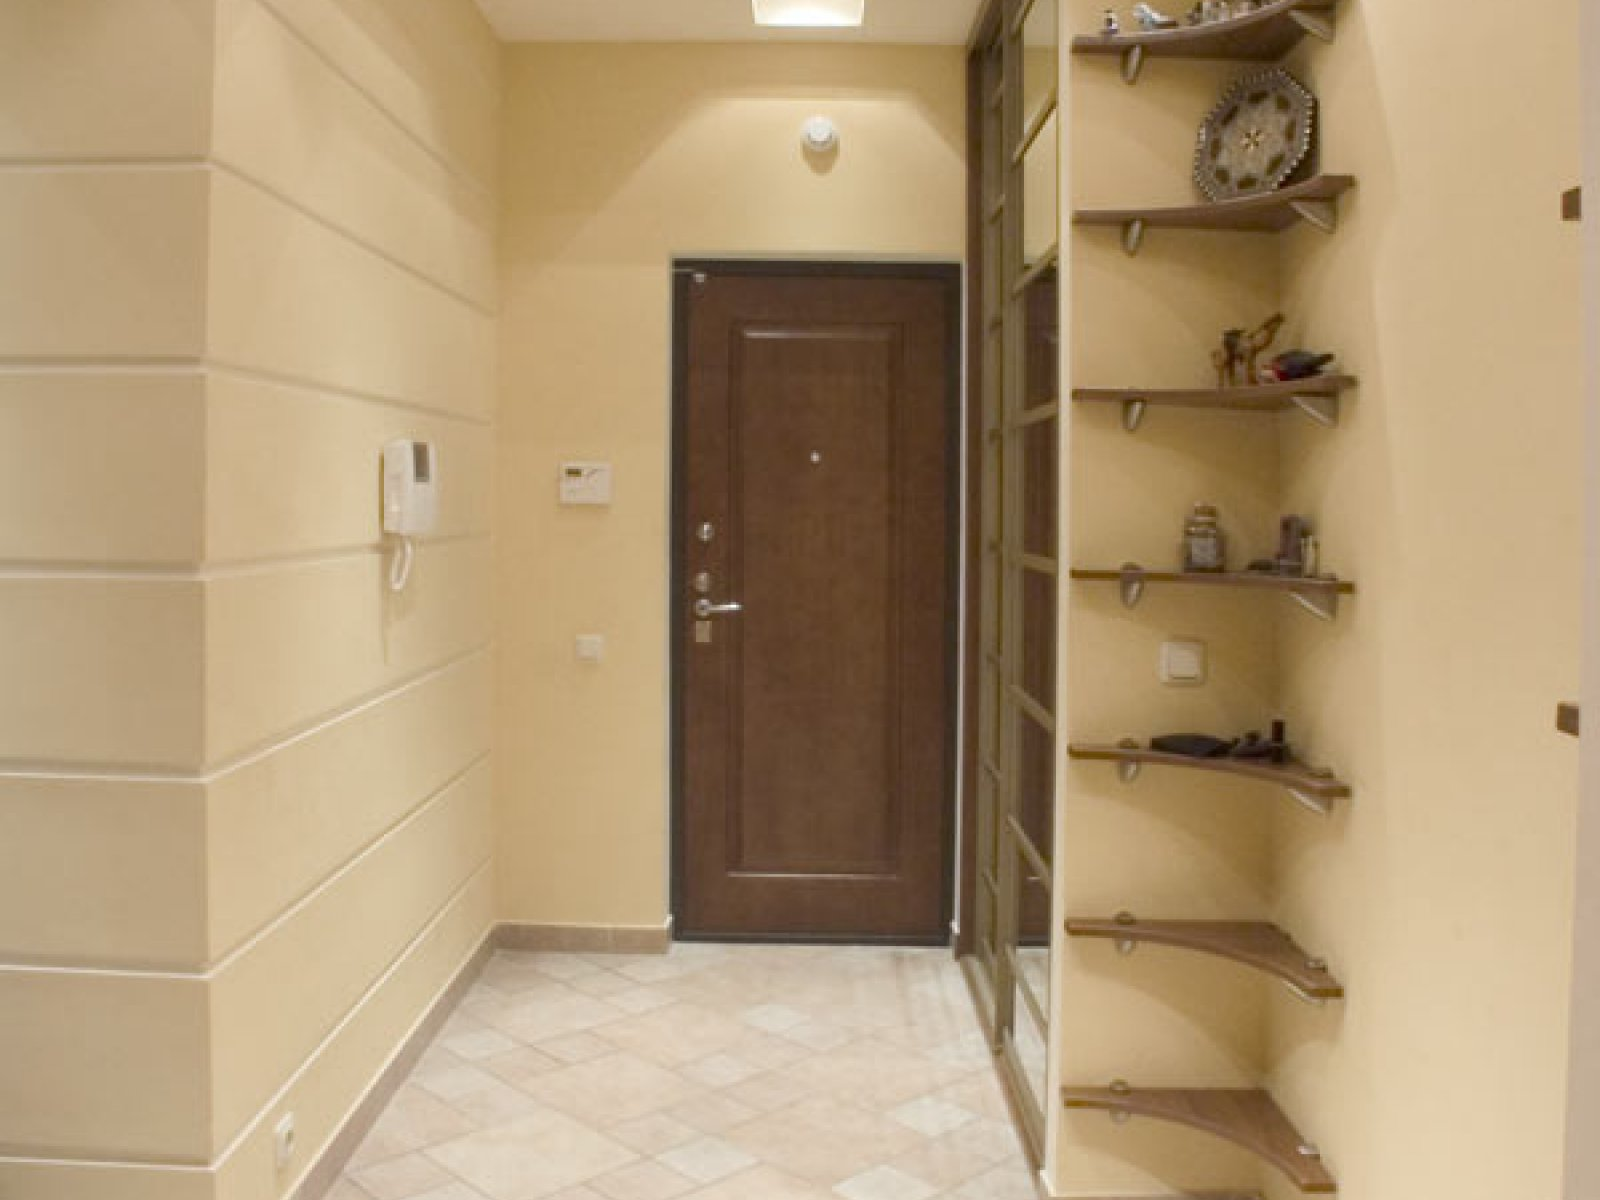 Ремонт коридора в квартире фото.